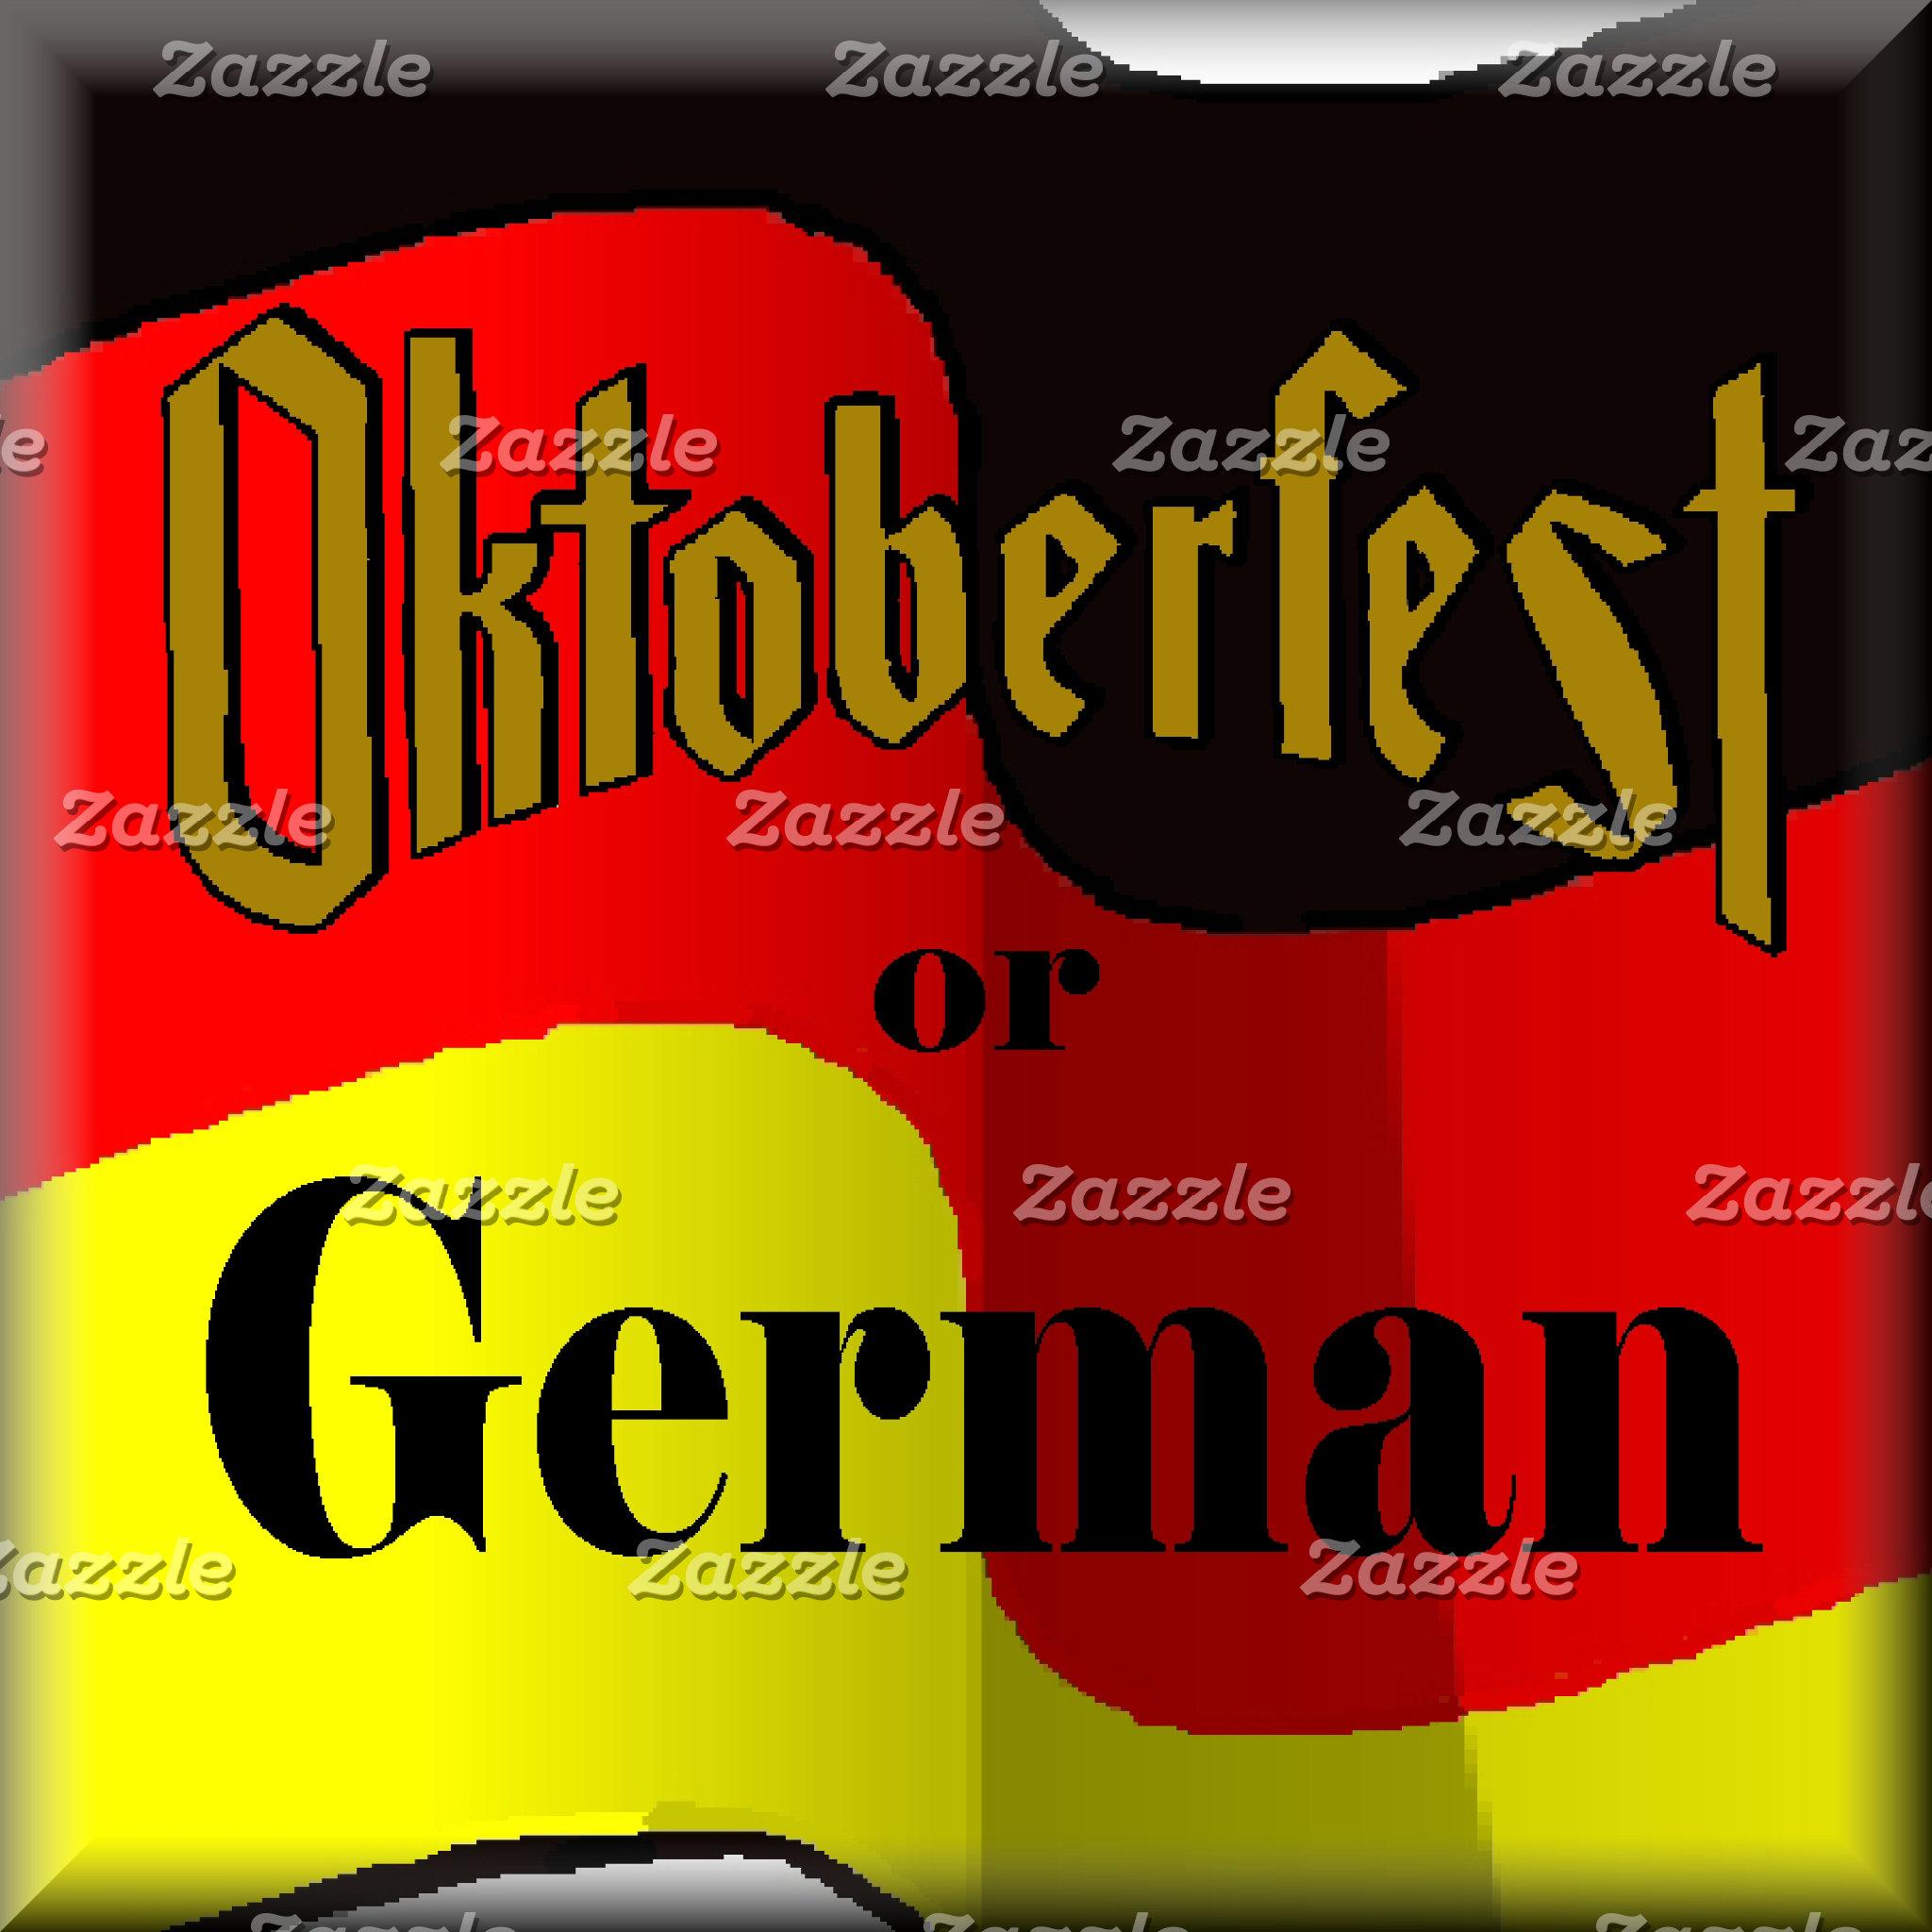 OKTOBERFEST or GERMAN